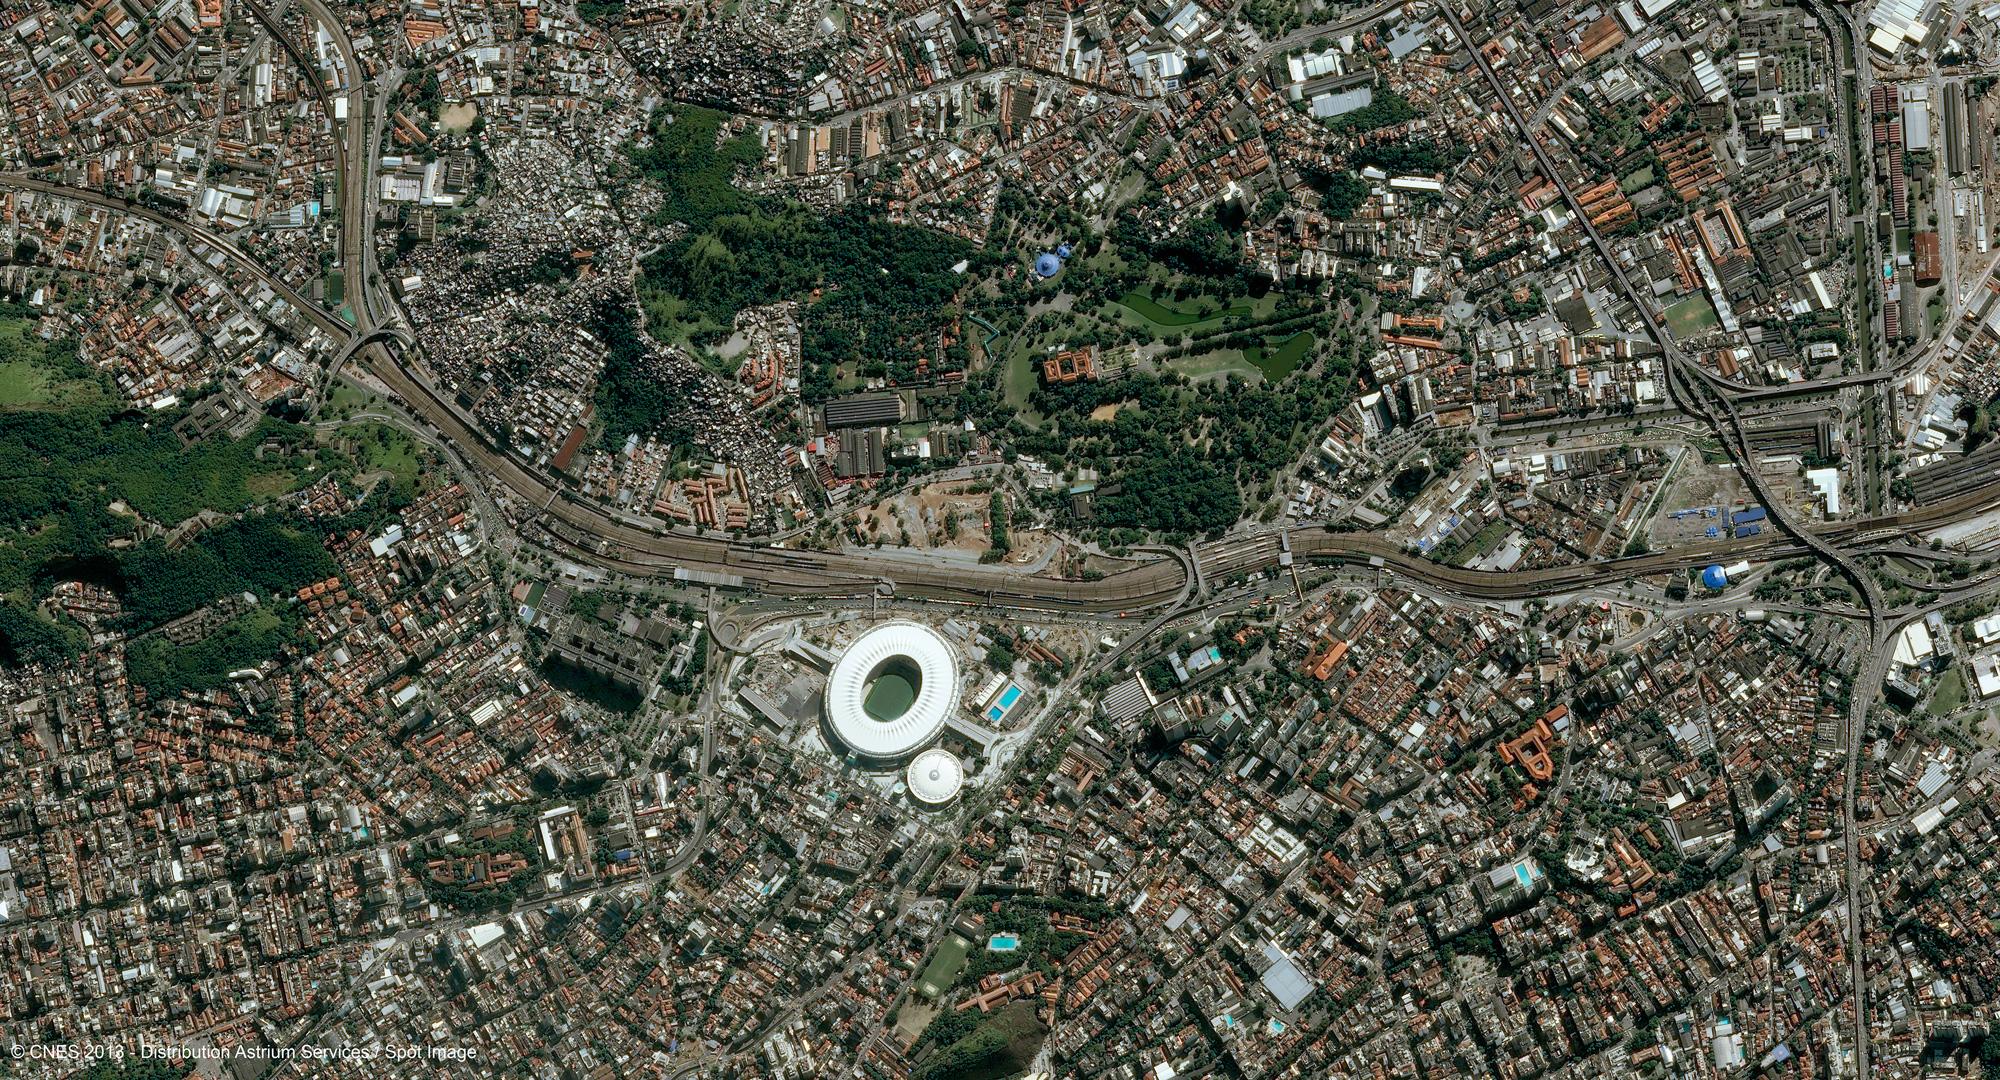 r23659_39_satellite_image_pleiades_rio_maracana_20130509-2-1_2000.jpg